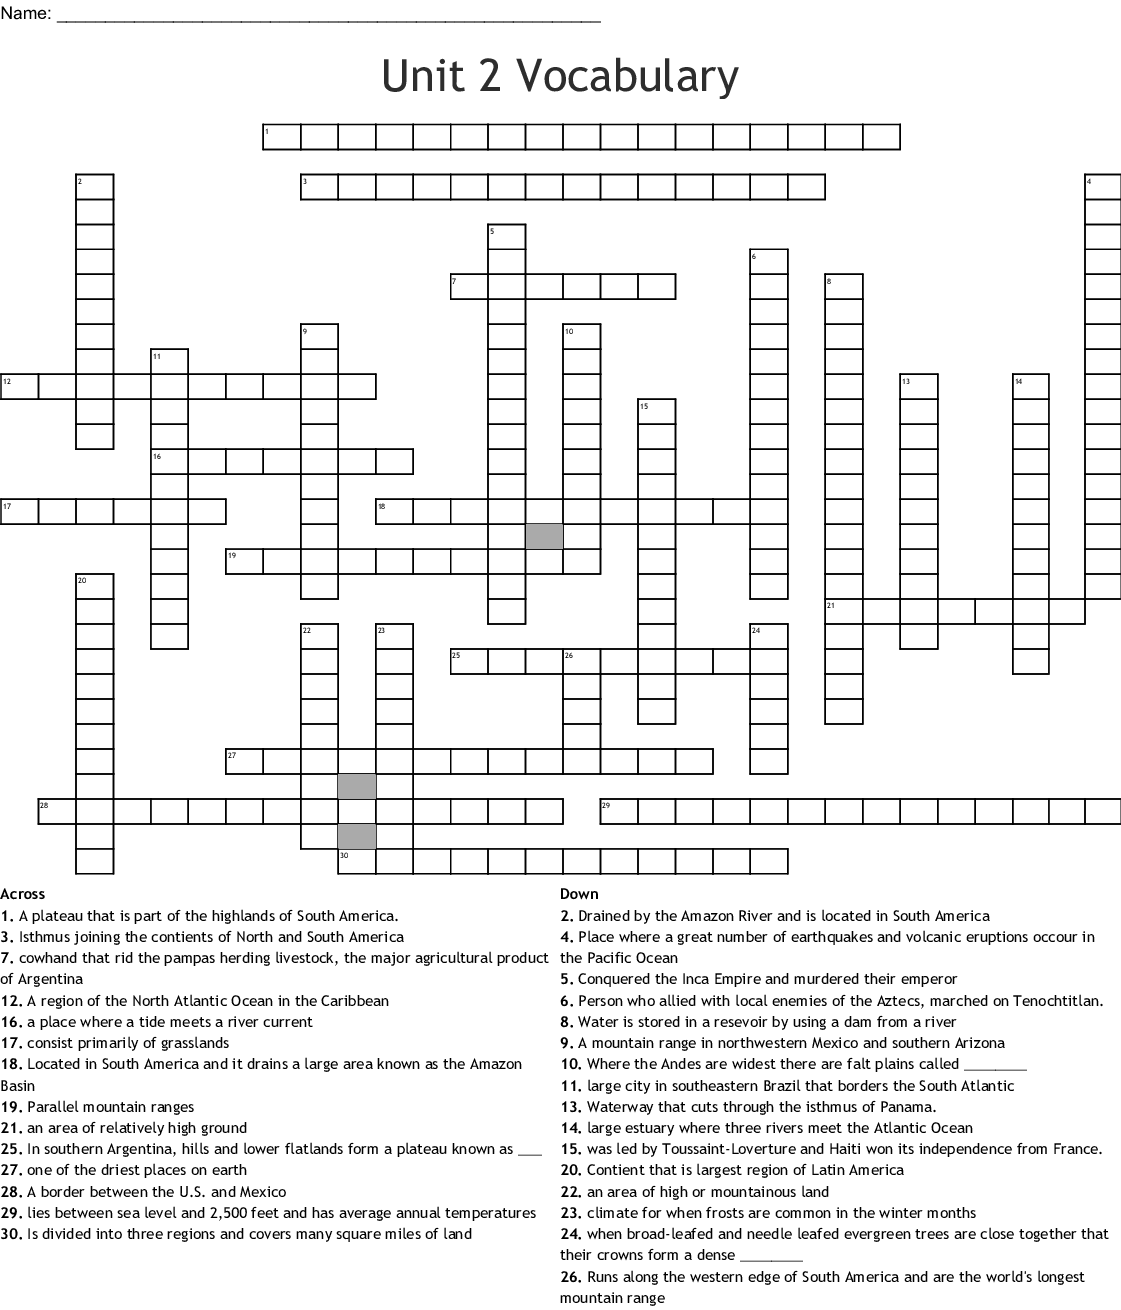 Unit 2 Vocabulary Crossword